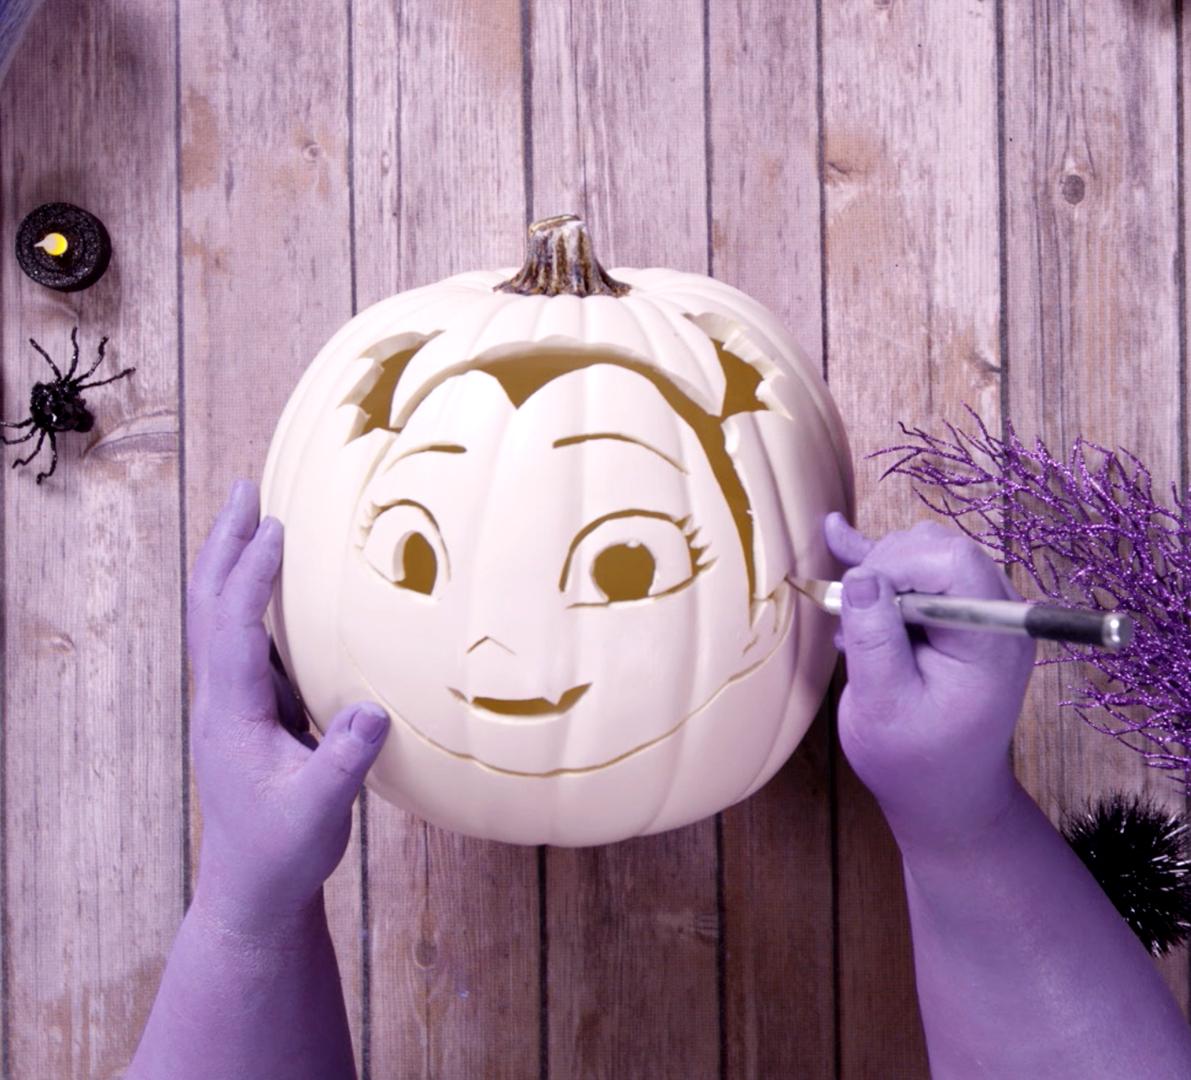 vampirina pumpkin template  Check out this fang-tastic Vampirina Pumpkin DIY and show ...